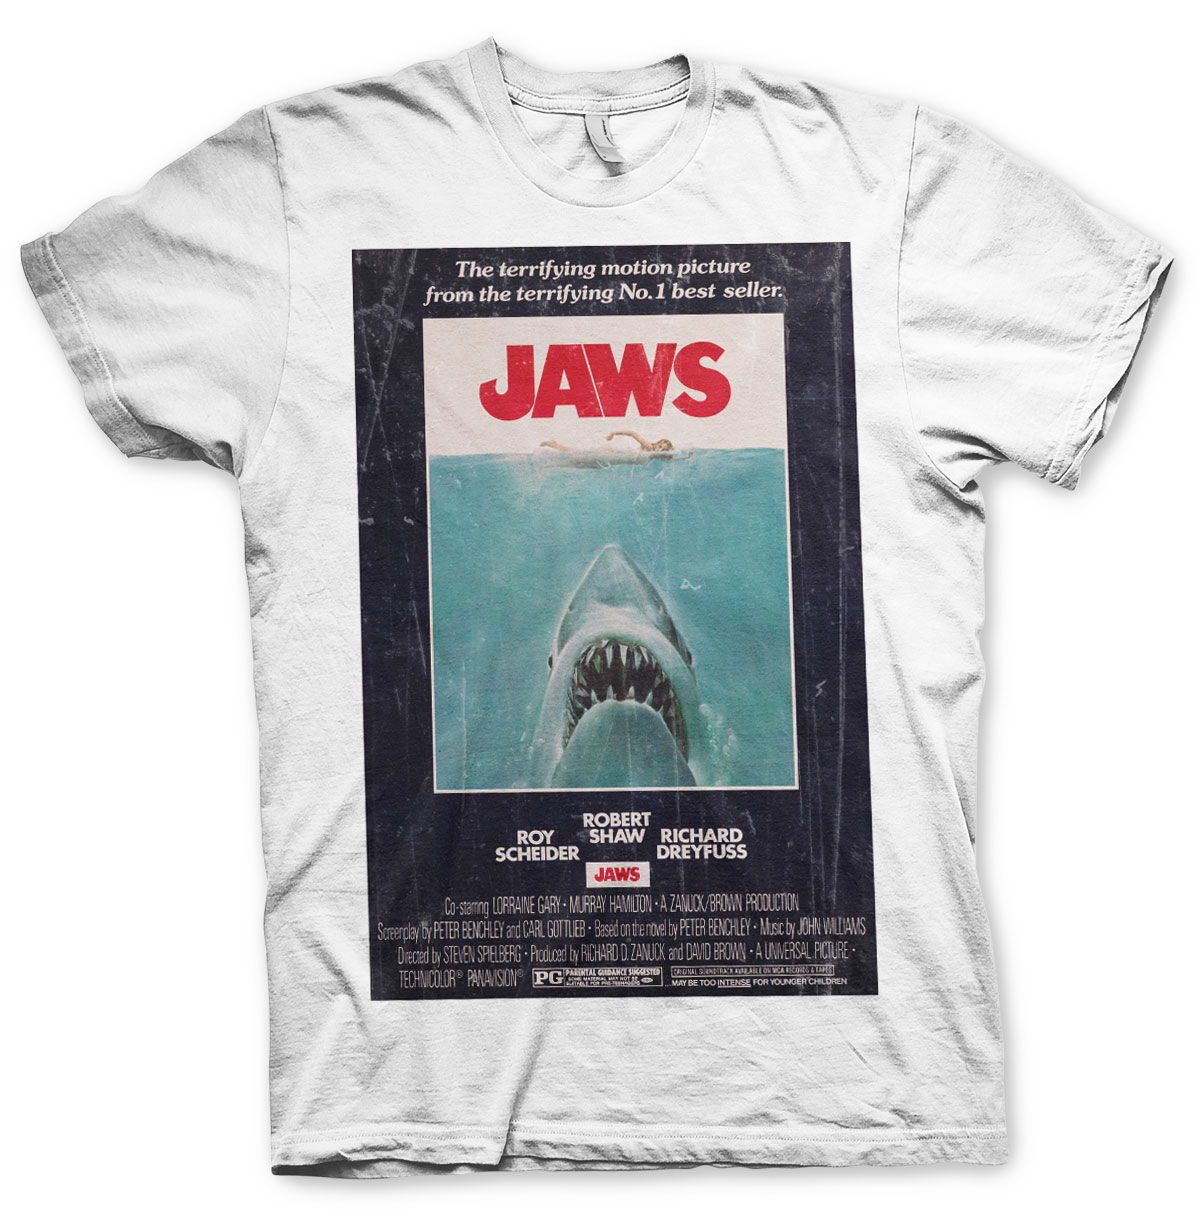 Jaws Vintage Original Poster T-Shirt